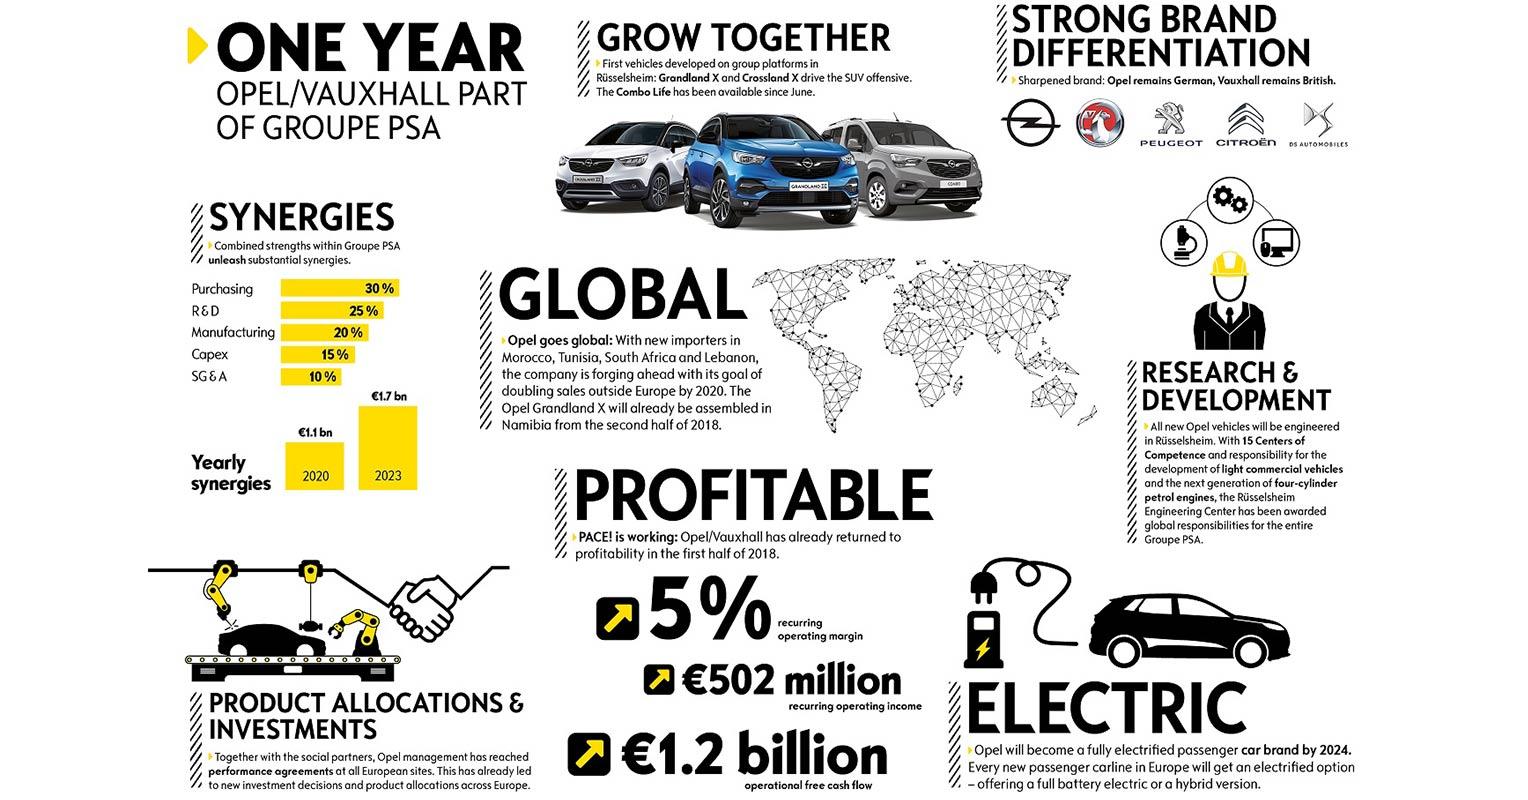 Opel recuperación económica